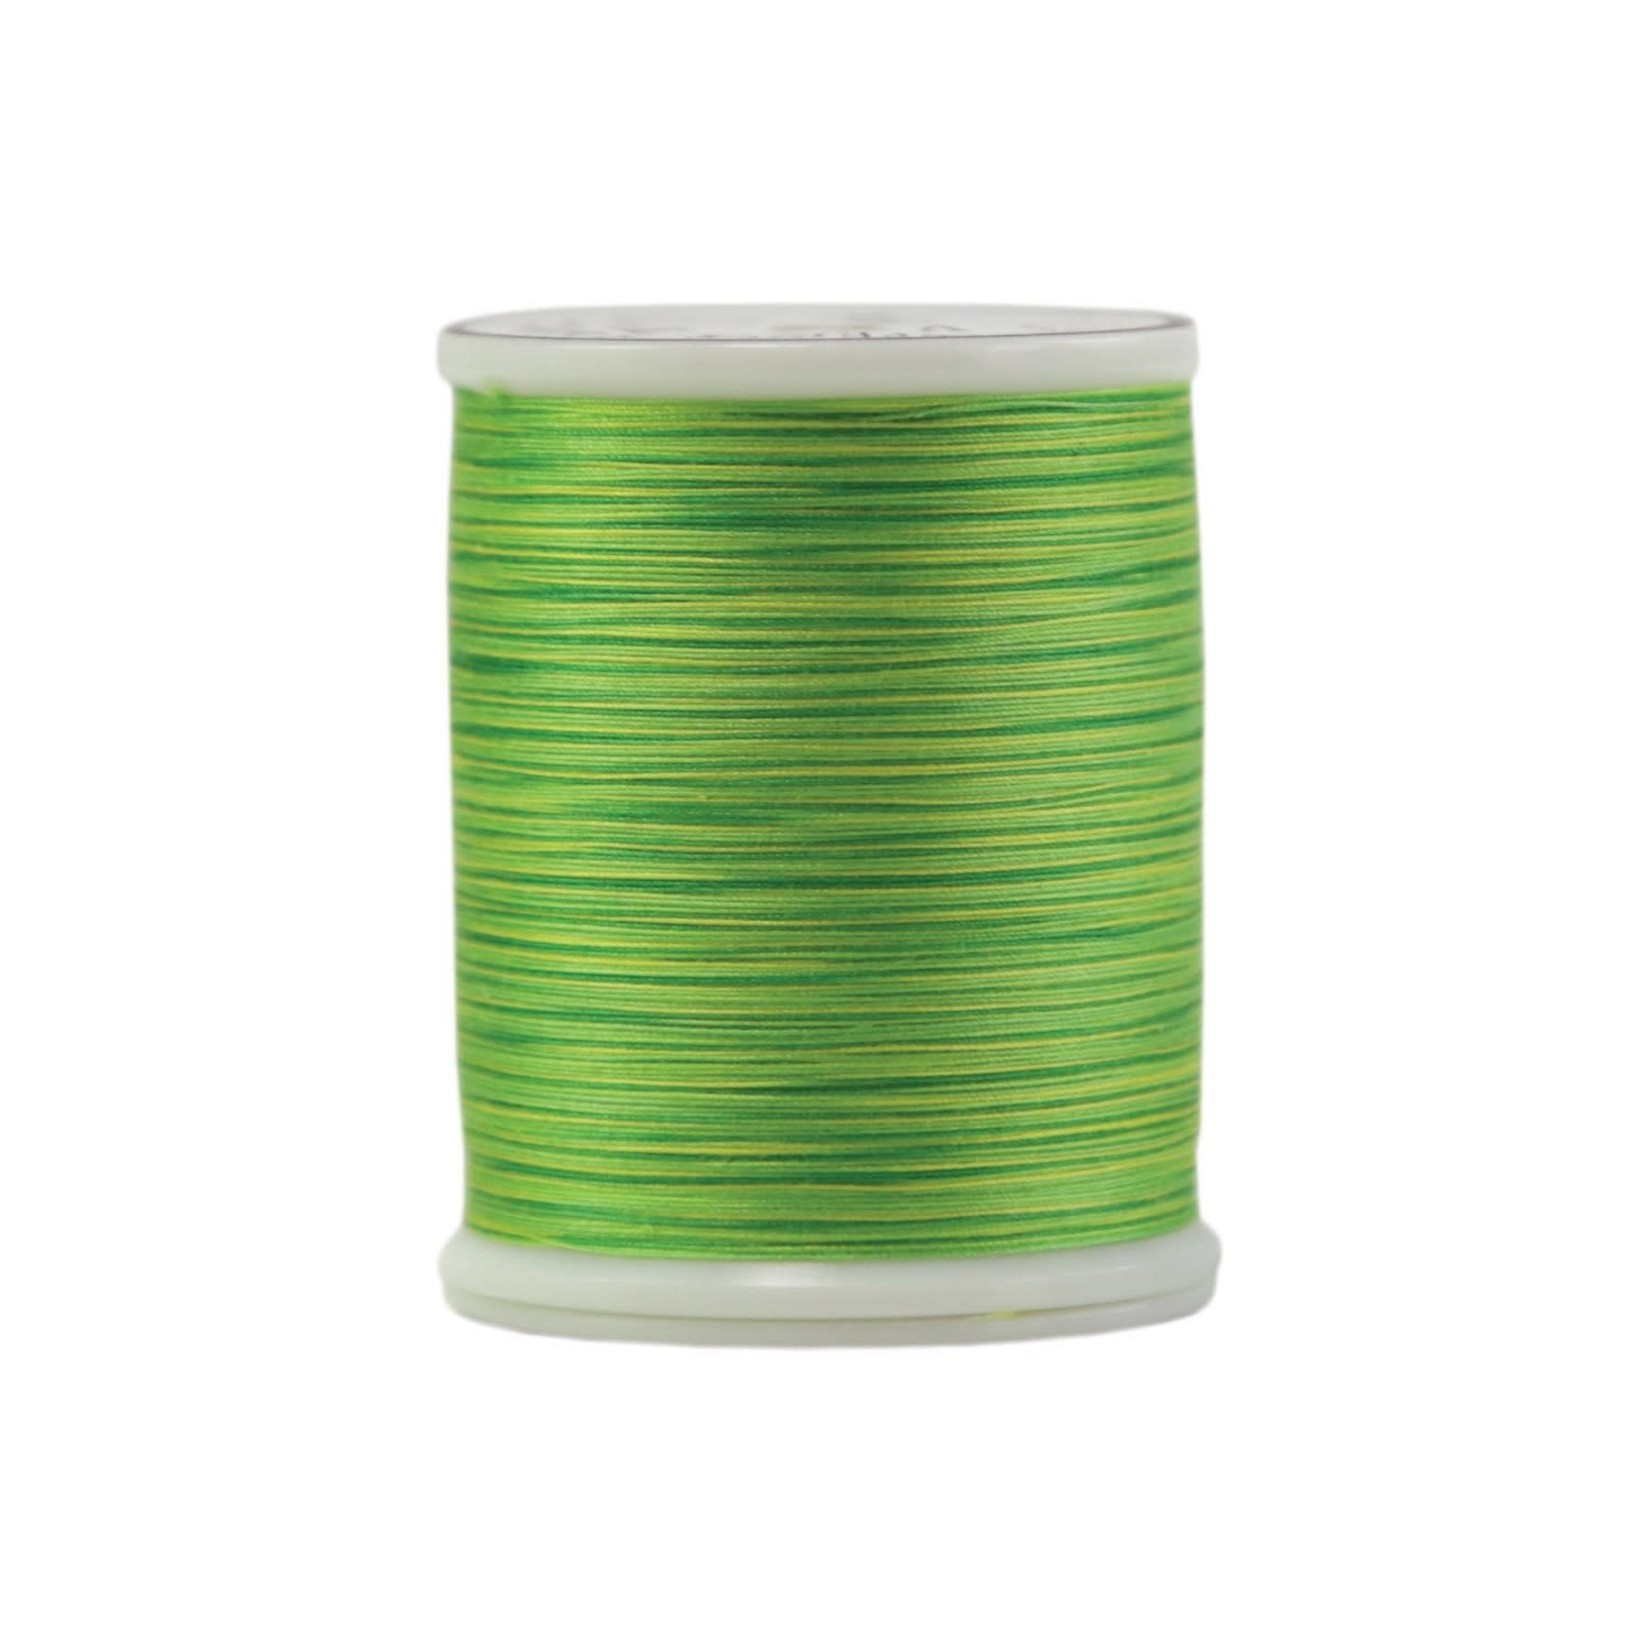 Superior Threads King Tut - #40 - 457 m - 1040 Big Island